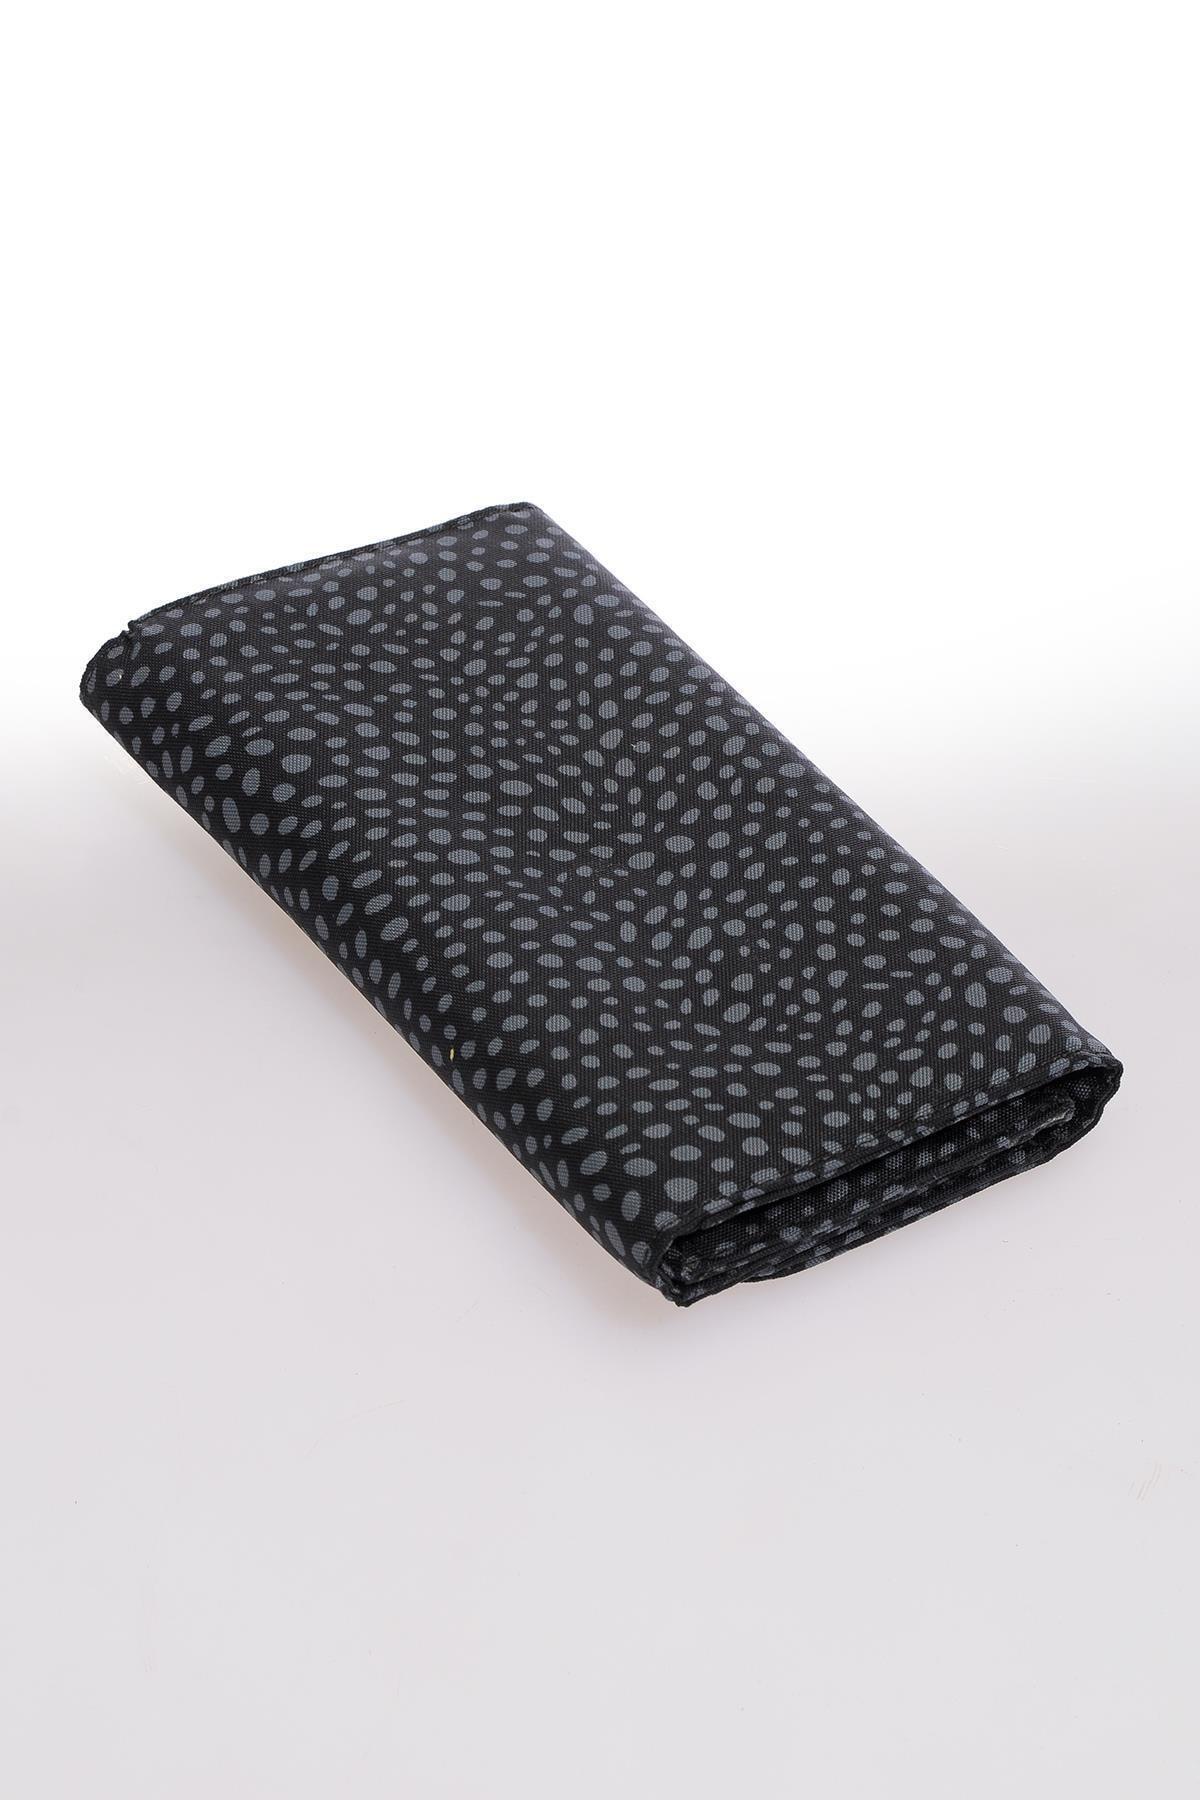 SMART BAGS Smb1225-0091 Siyah/puantiye Kadın Cüzdan 2